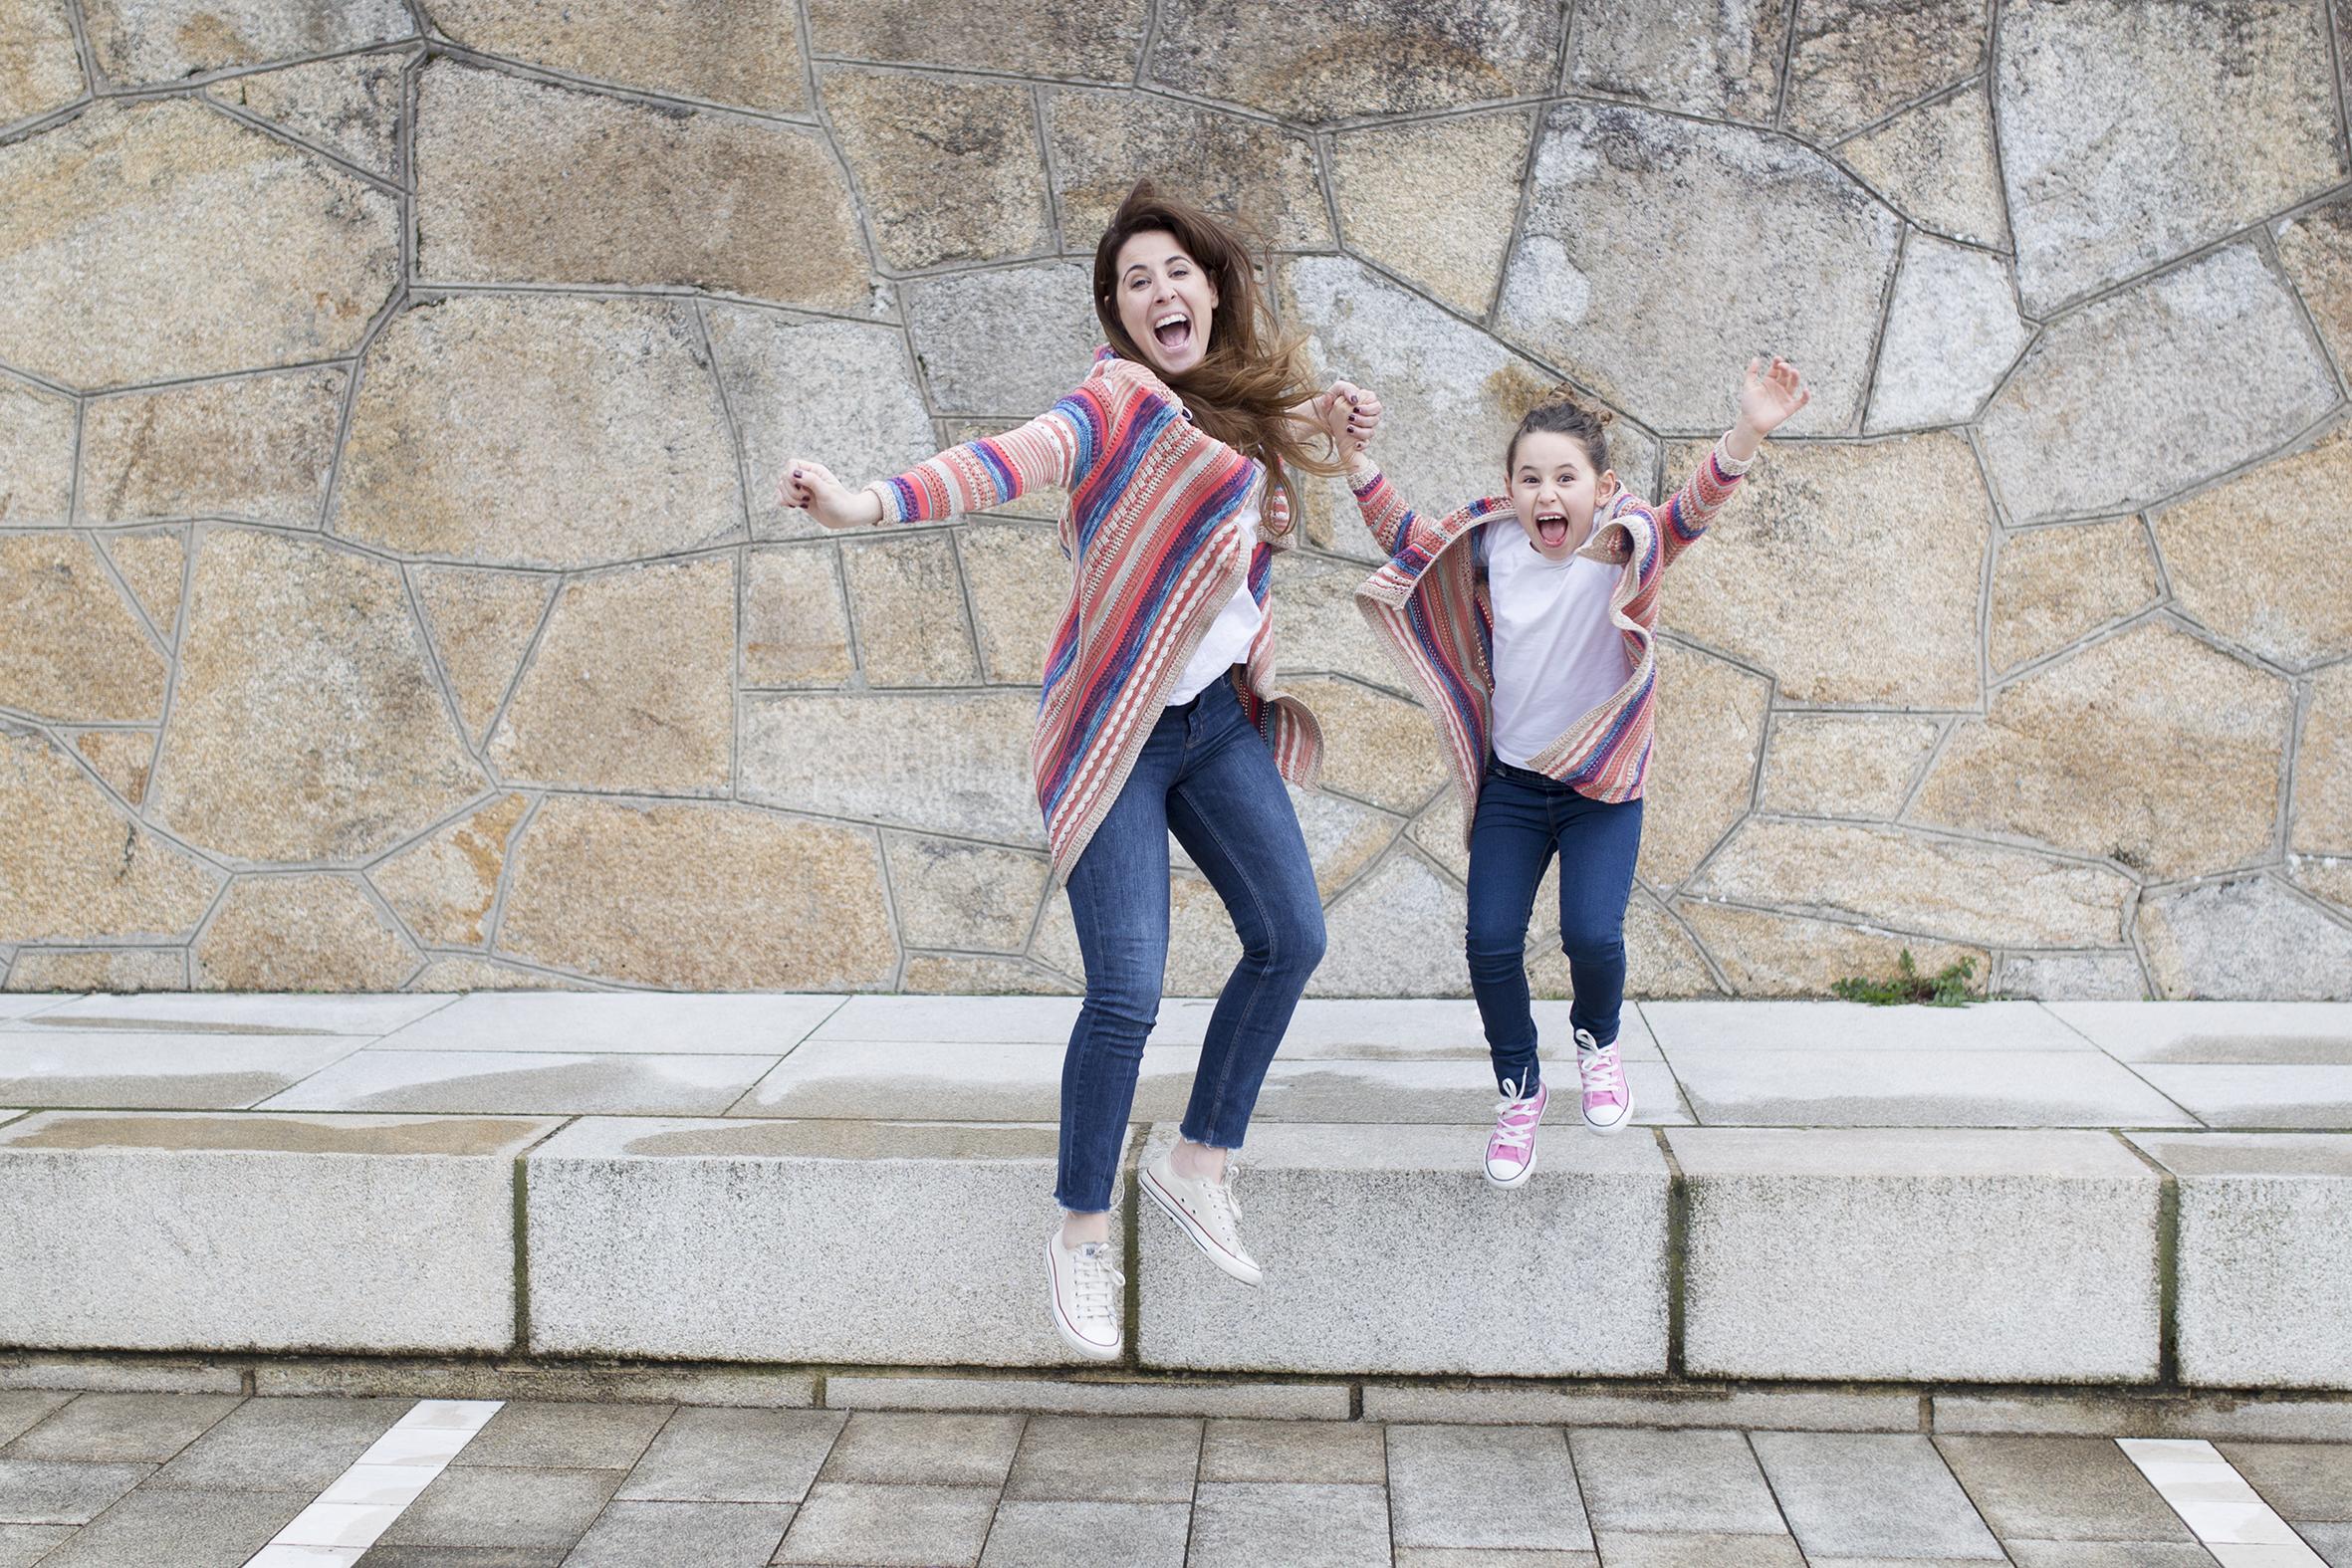 smile-felicidad-fashion-style-converse-jimena & me-madre e hija-Viajar en familia-descalzaporelparque-coruña-lifestyle- kids- converse-daughter